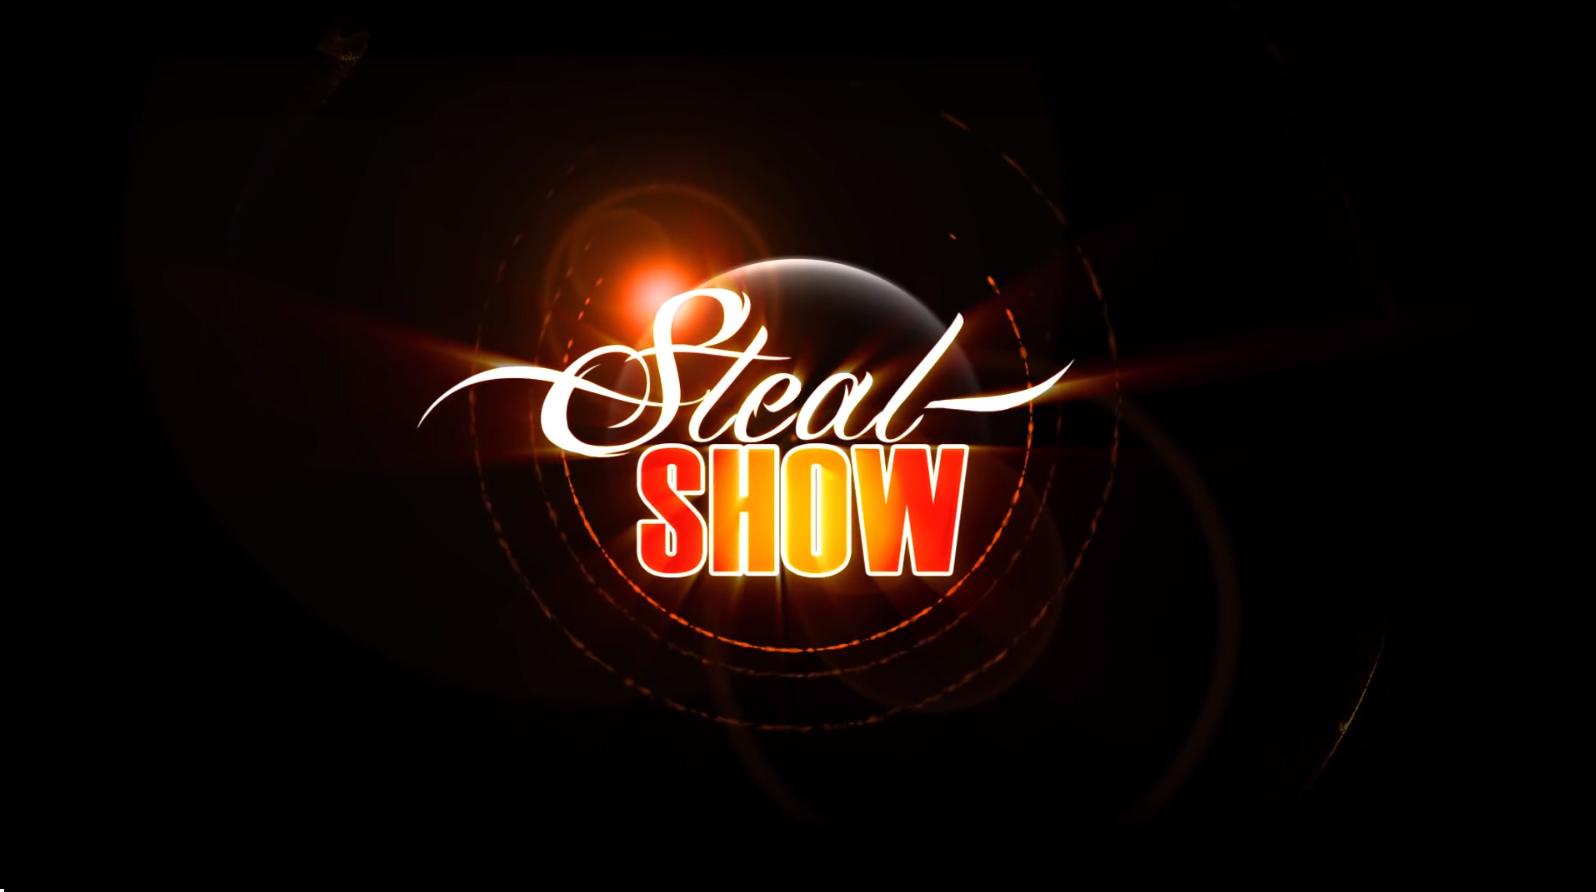 MOSEEK Steal-Show (Official Videoclip)